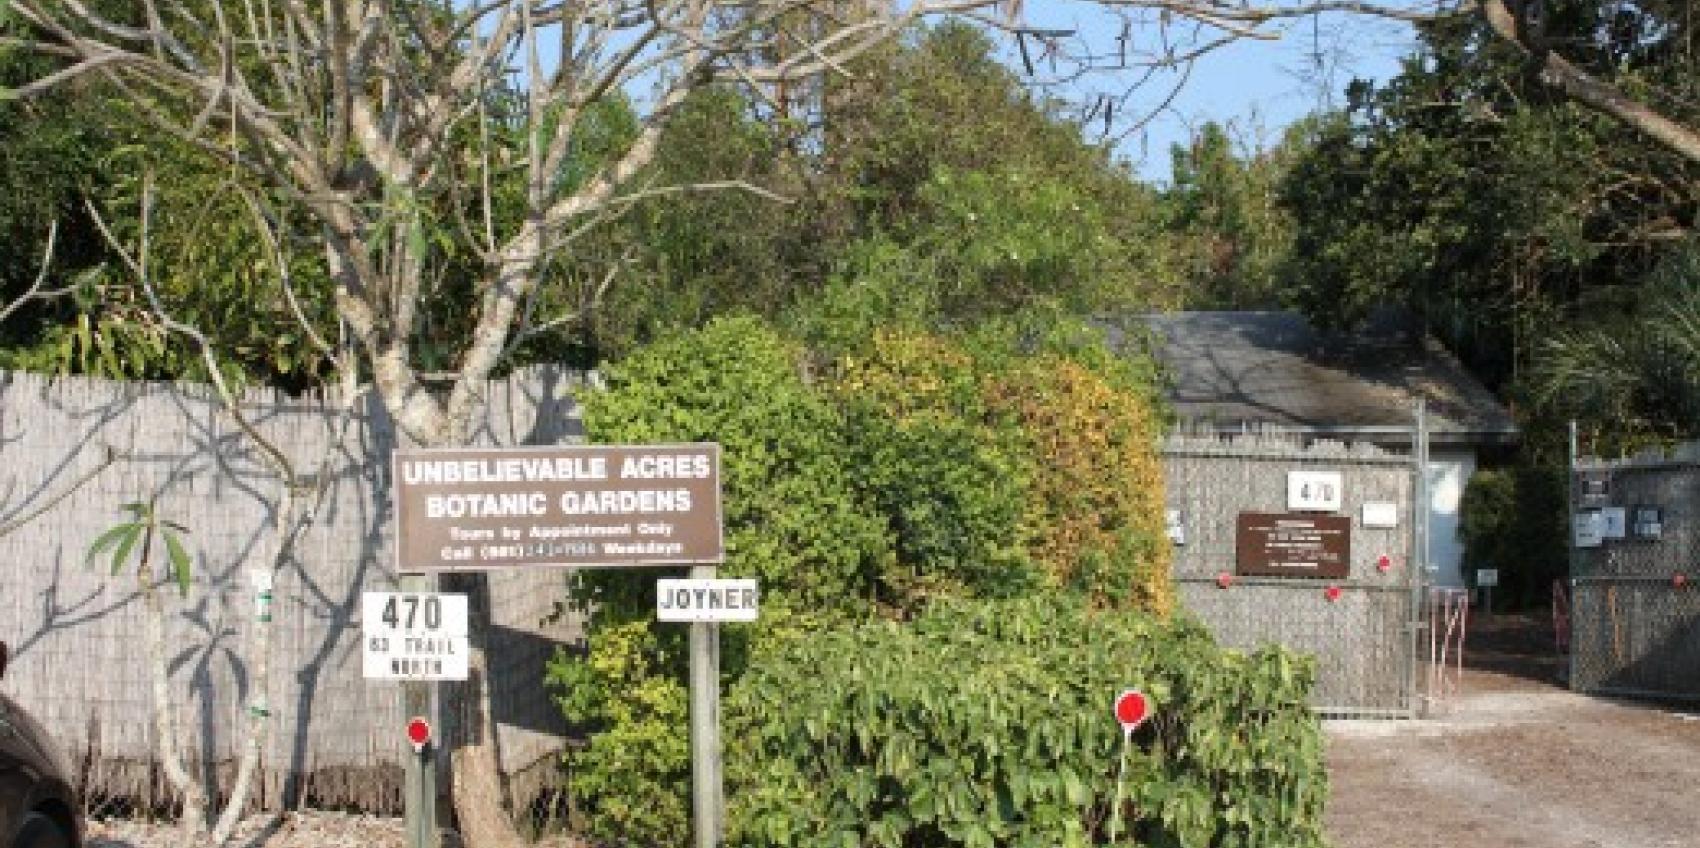 Unbelievable Acres Botanic Gardens, Inc.   American Public Gardens ...